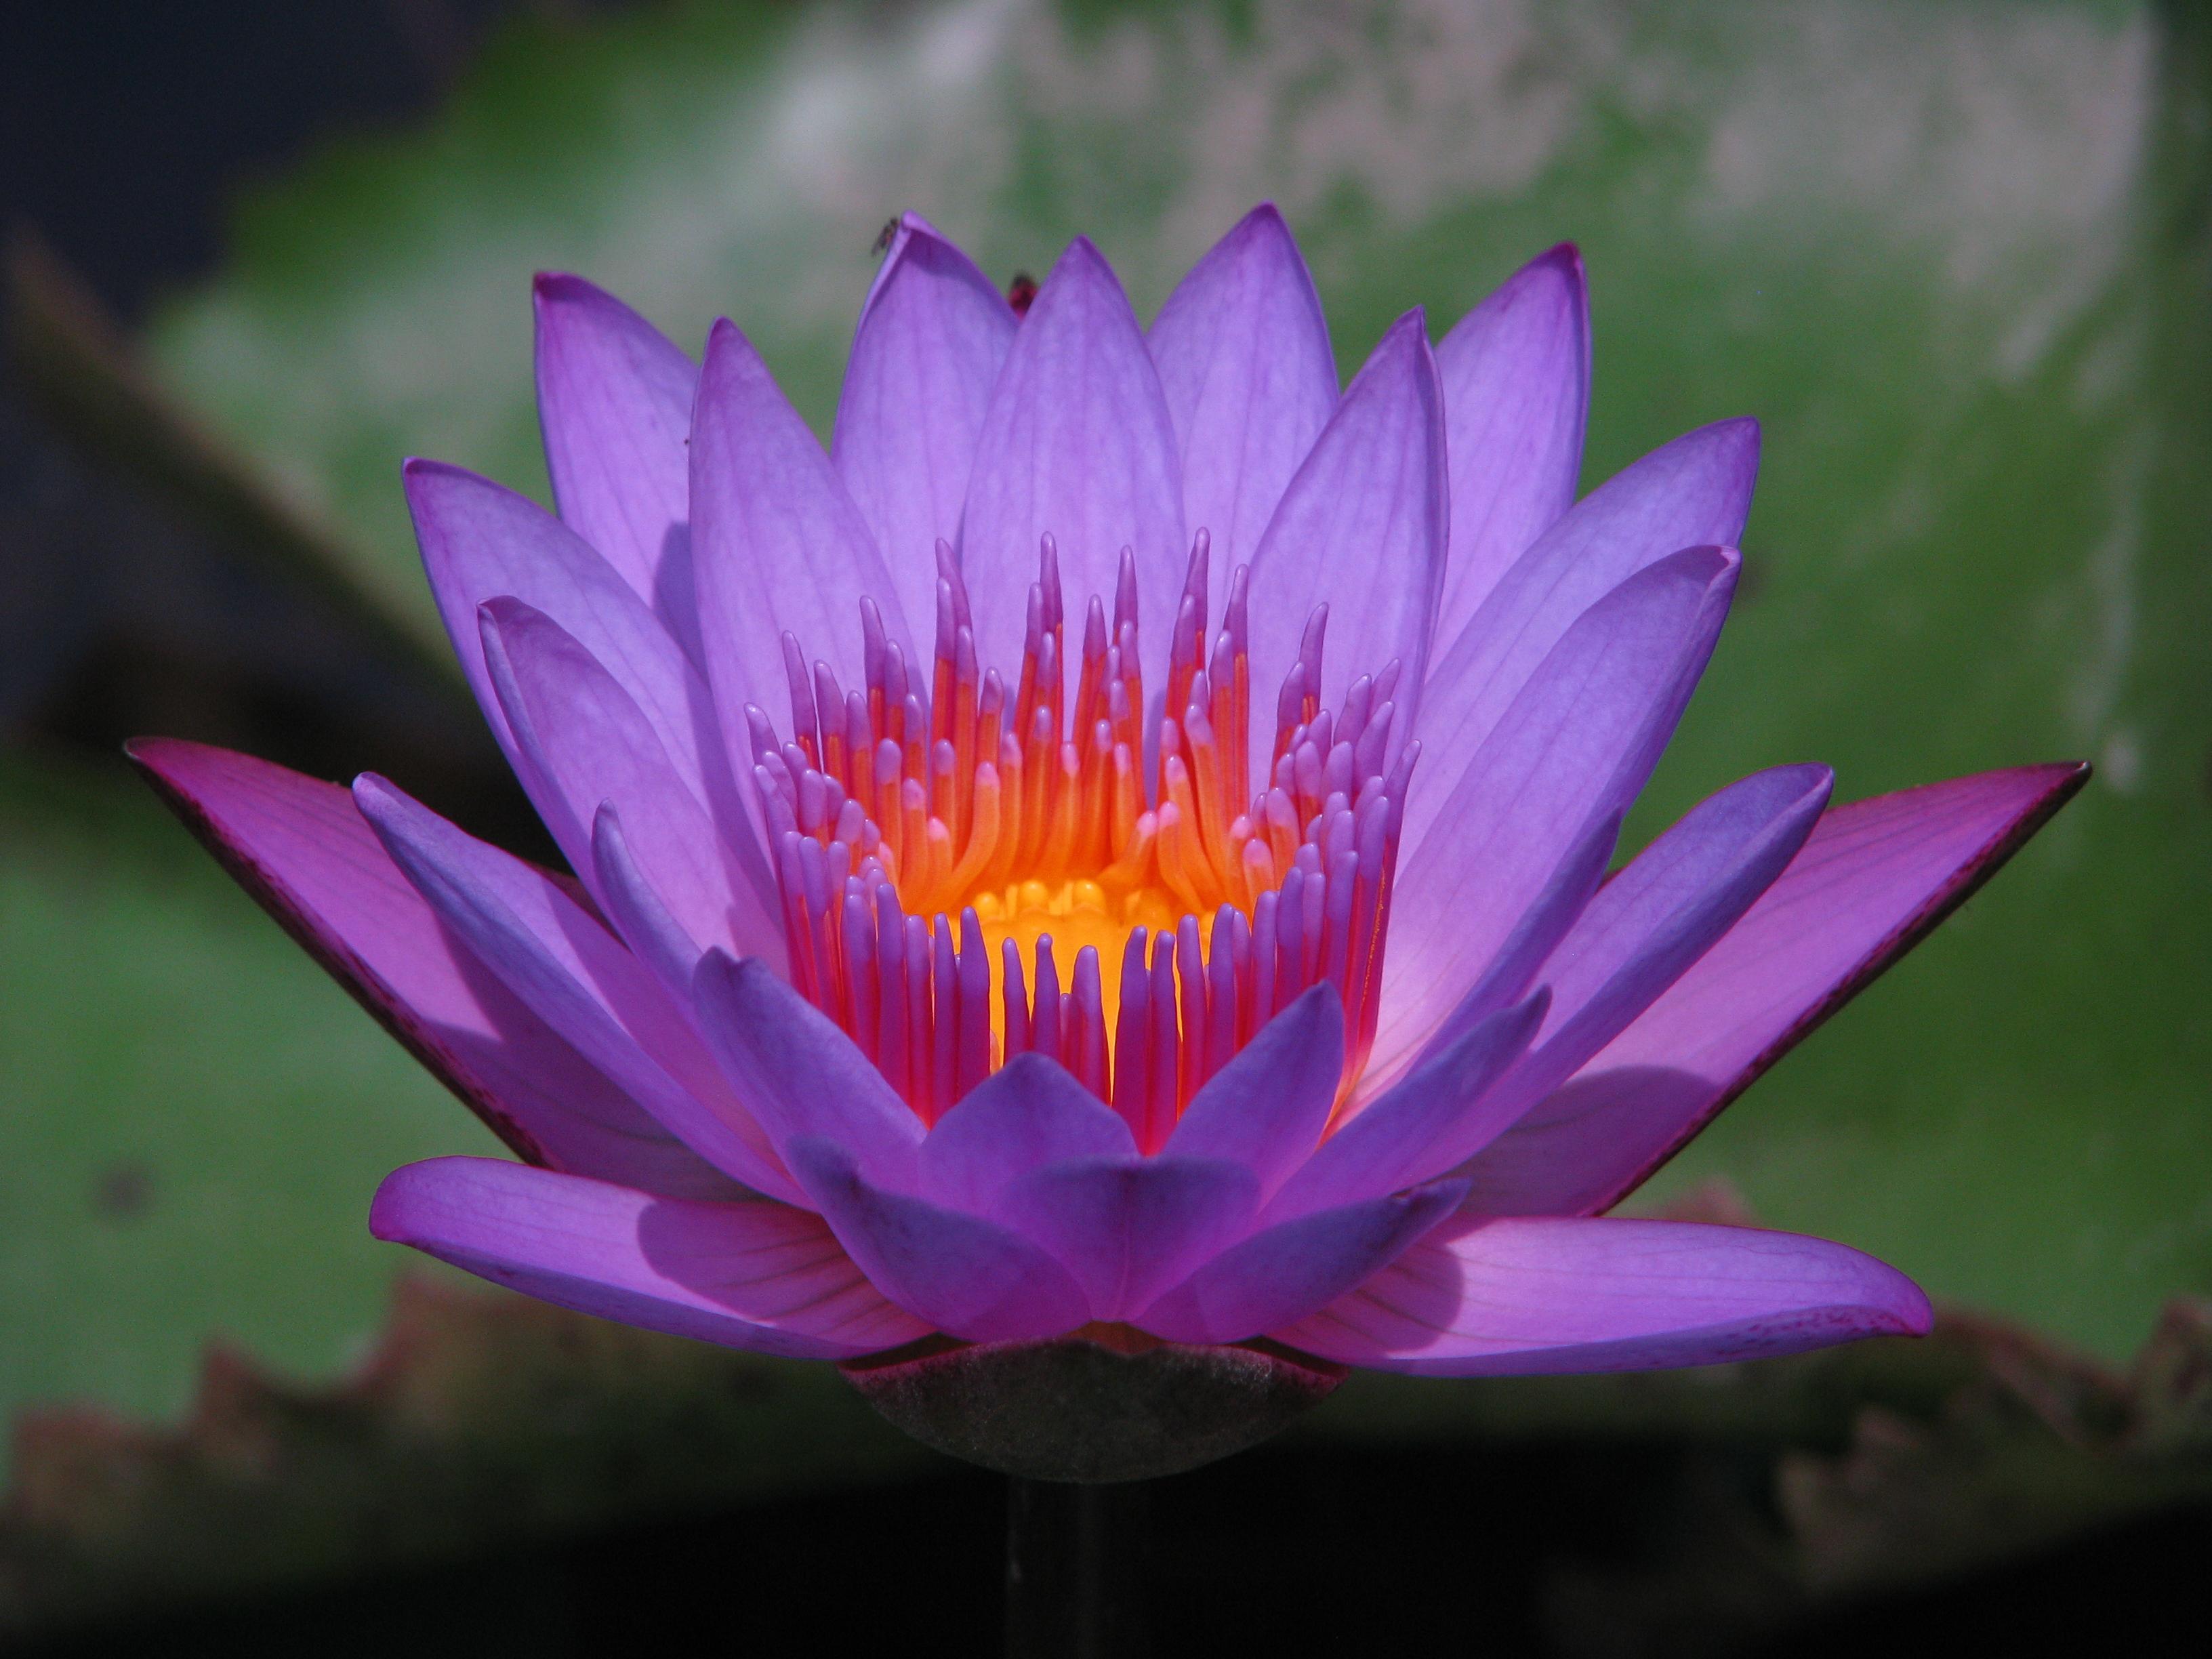 sp13ethnobotany Blue Lotus